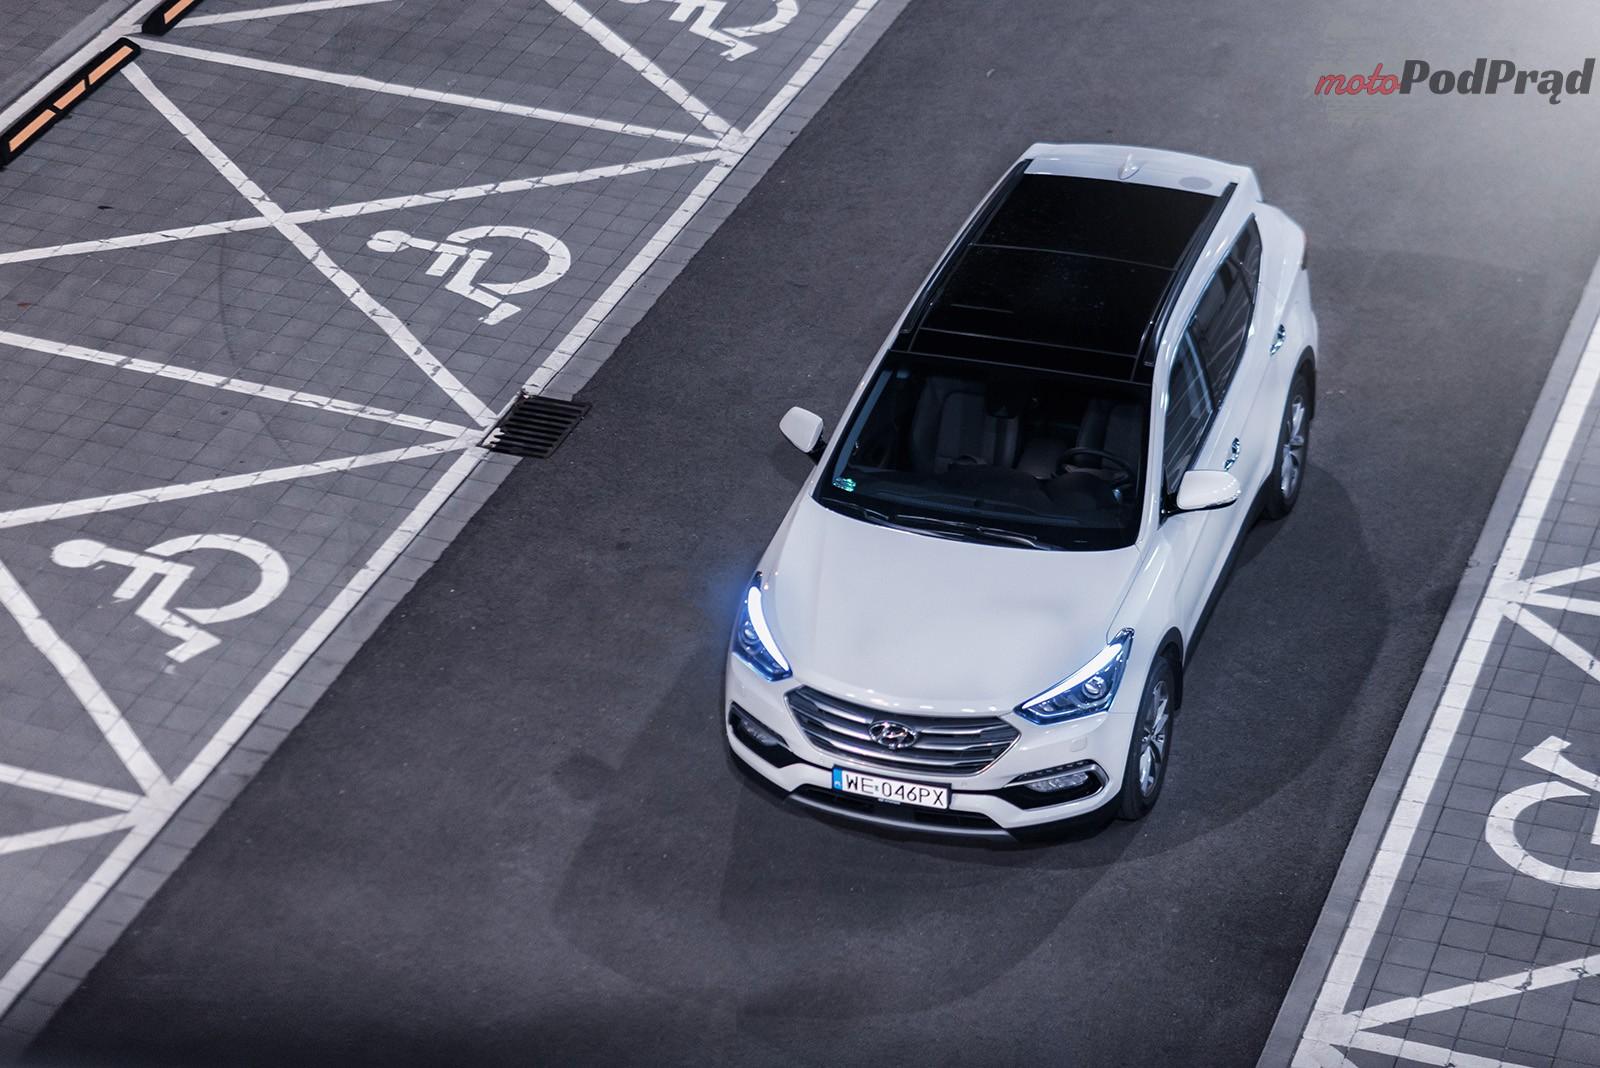 Hyundai Santa Fe 21 Test: Hyundai Santa Fe 2.2 CRDi 200 KM   wczasy na kołach